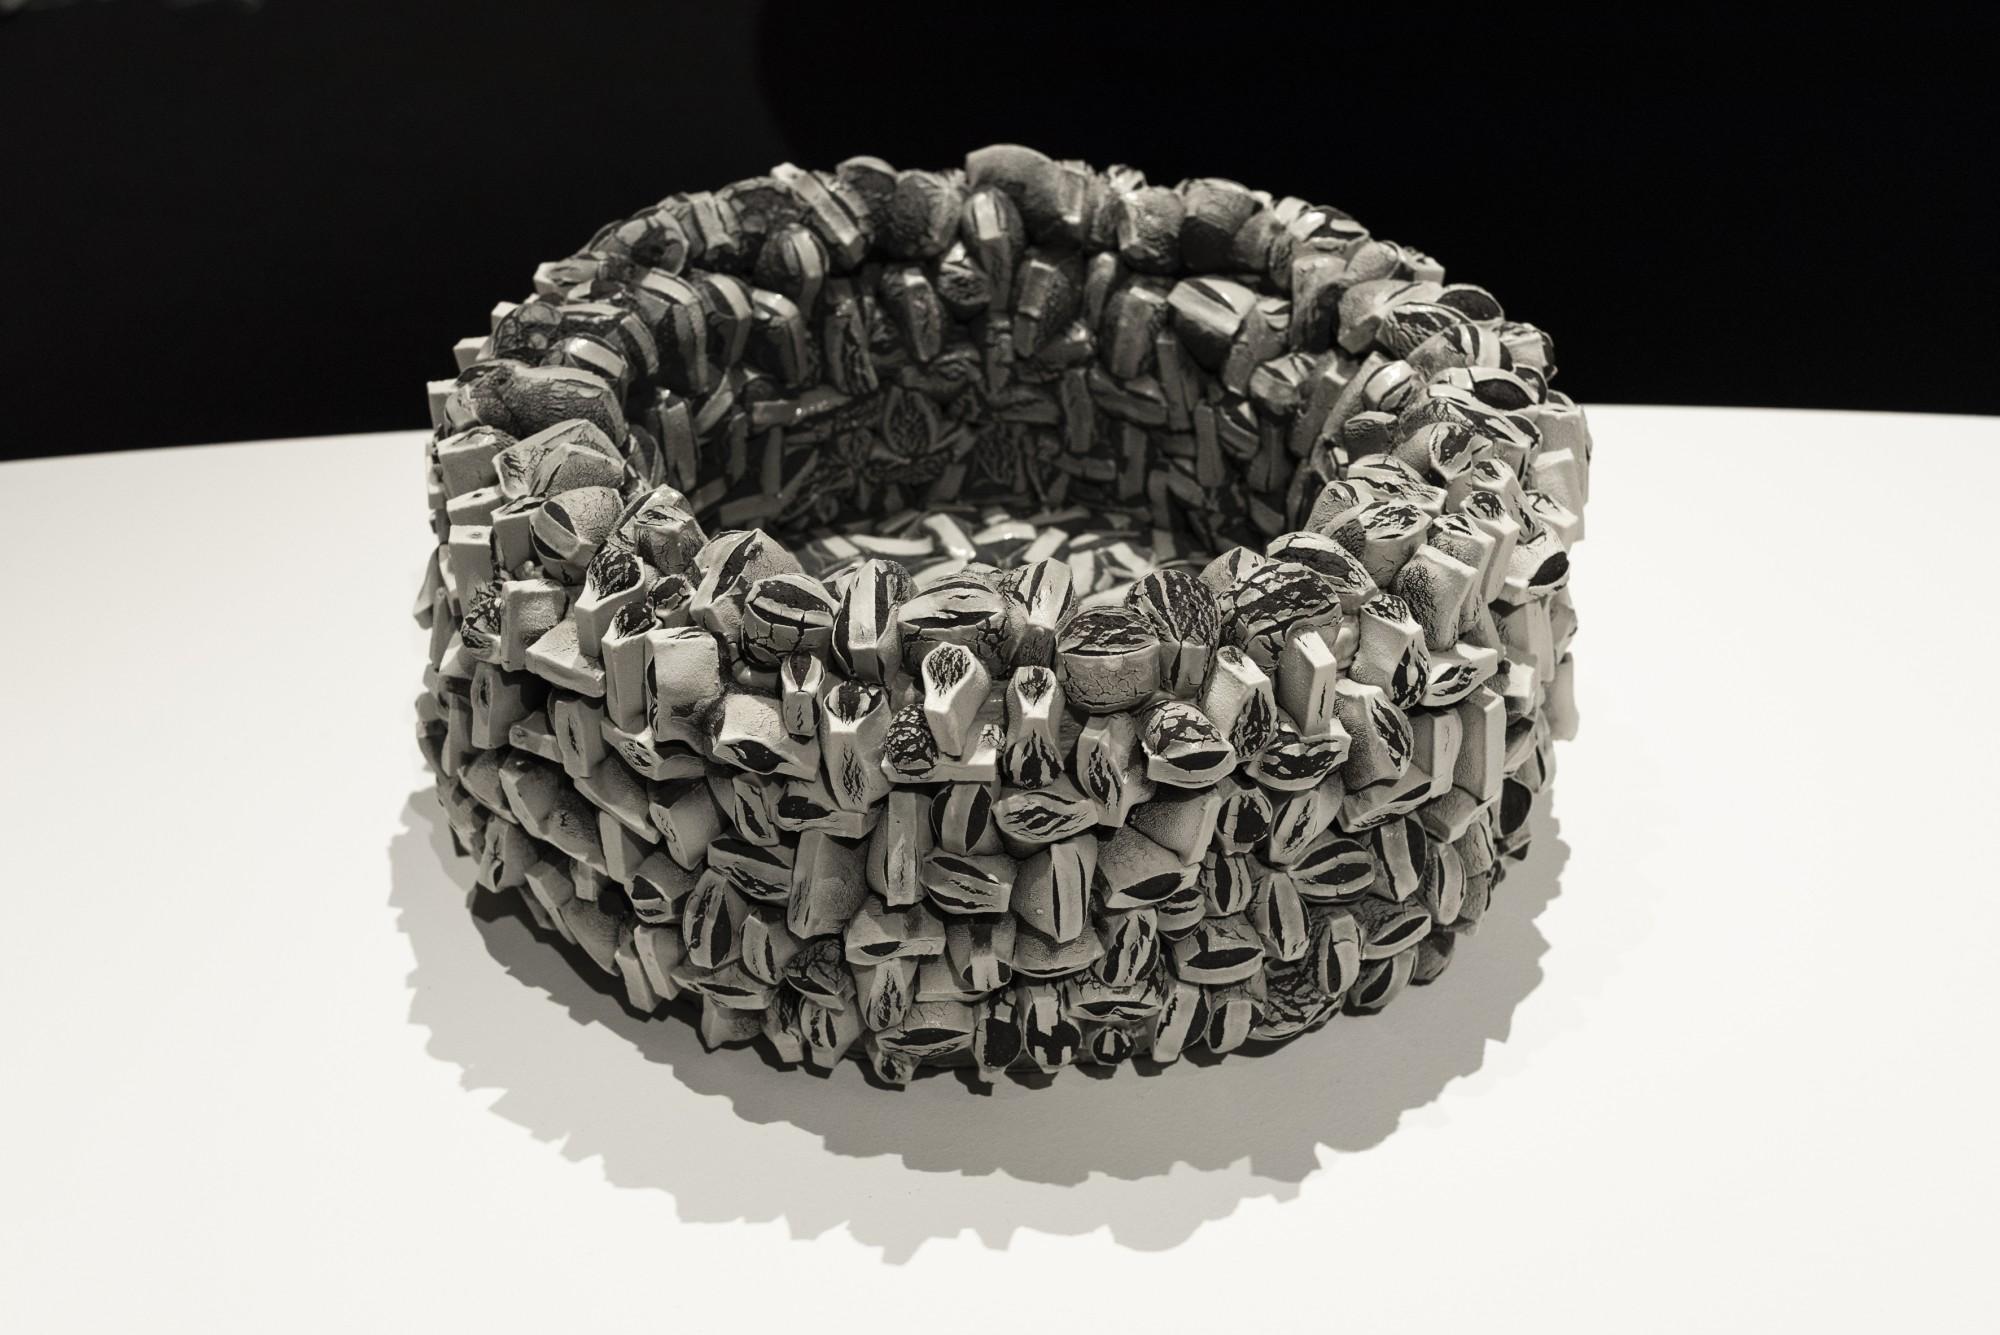 d209fa9ecb244 courtesy of  Officine Saffi Ceramic sculpture Rafael Pérez creates a woven  basket-like structure from black earthenware covered in white porcelain  strips.